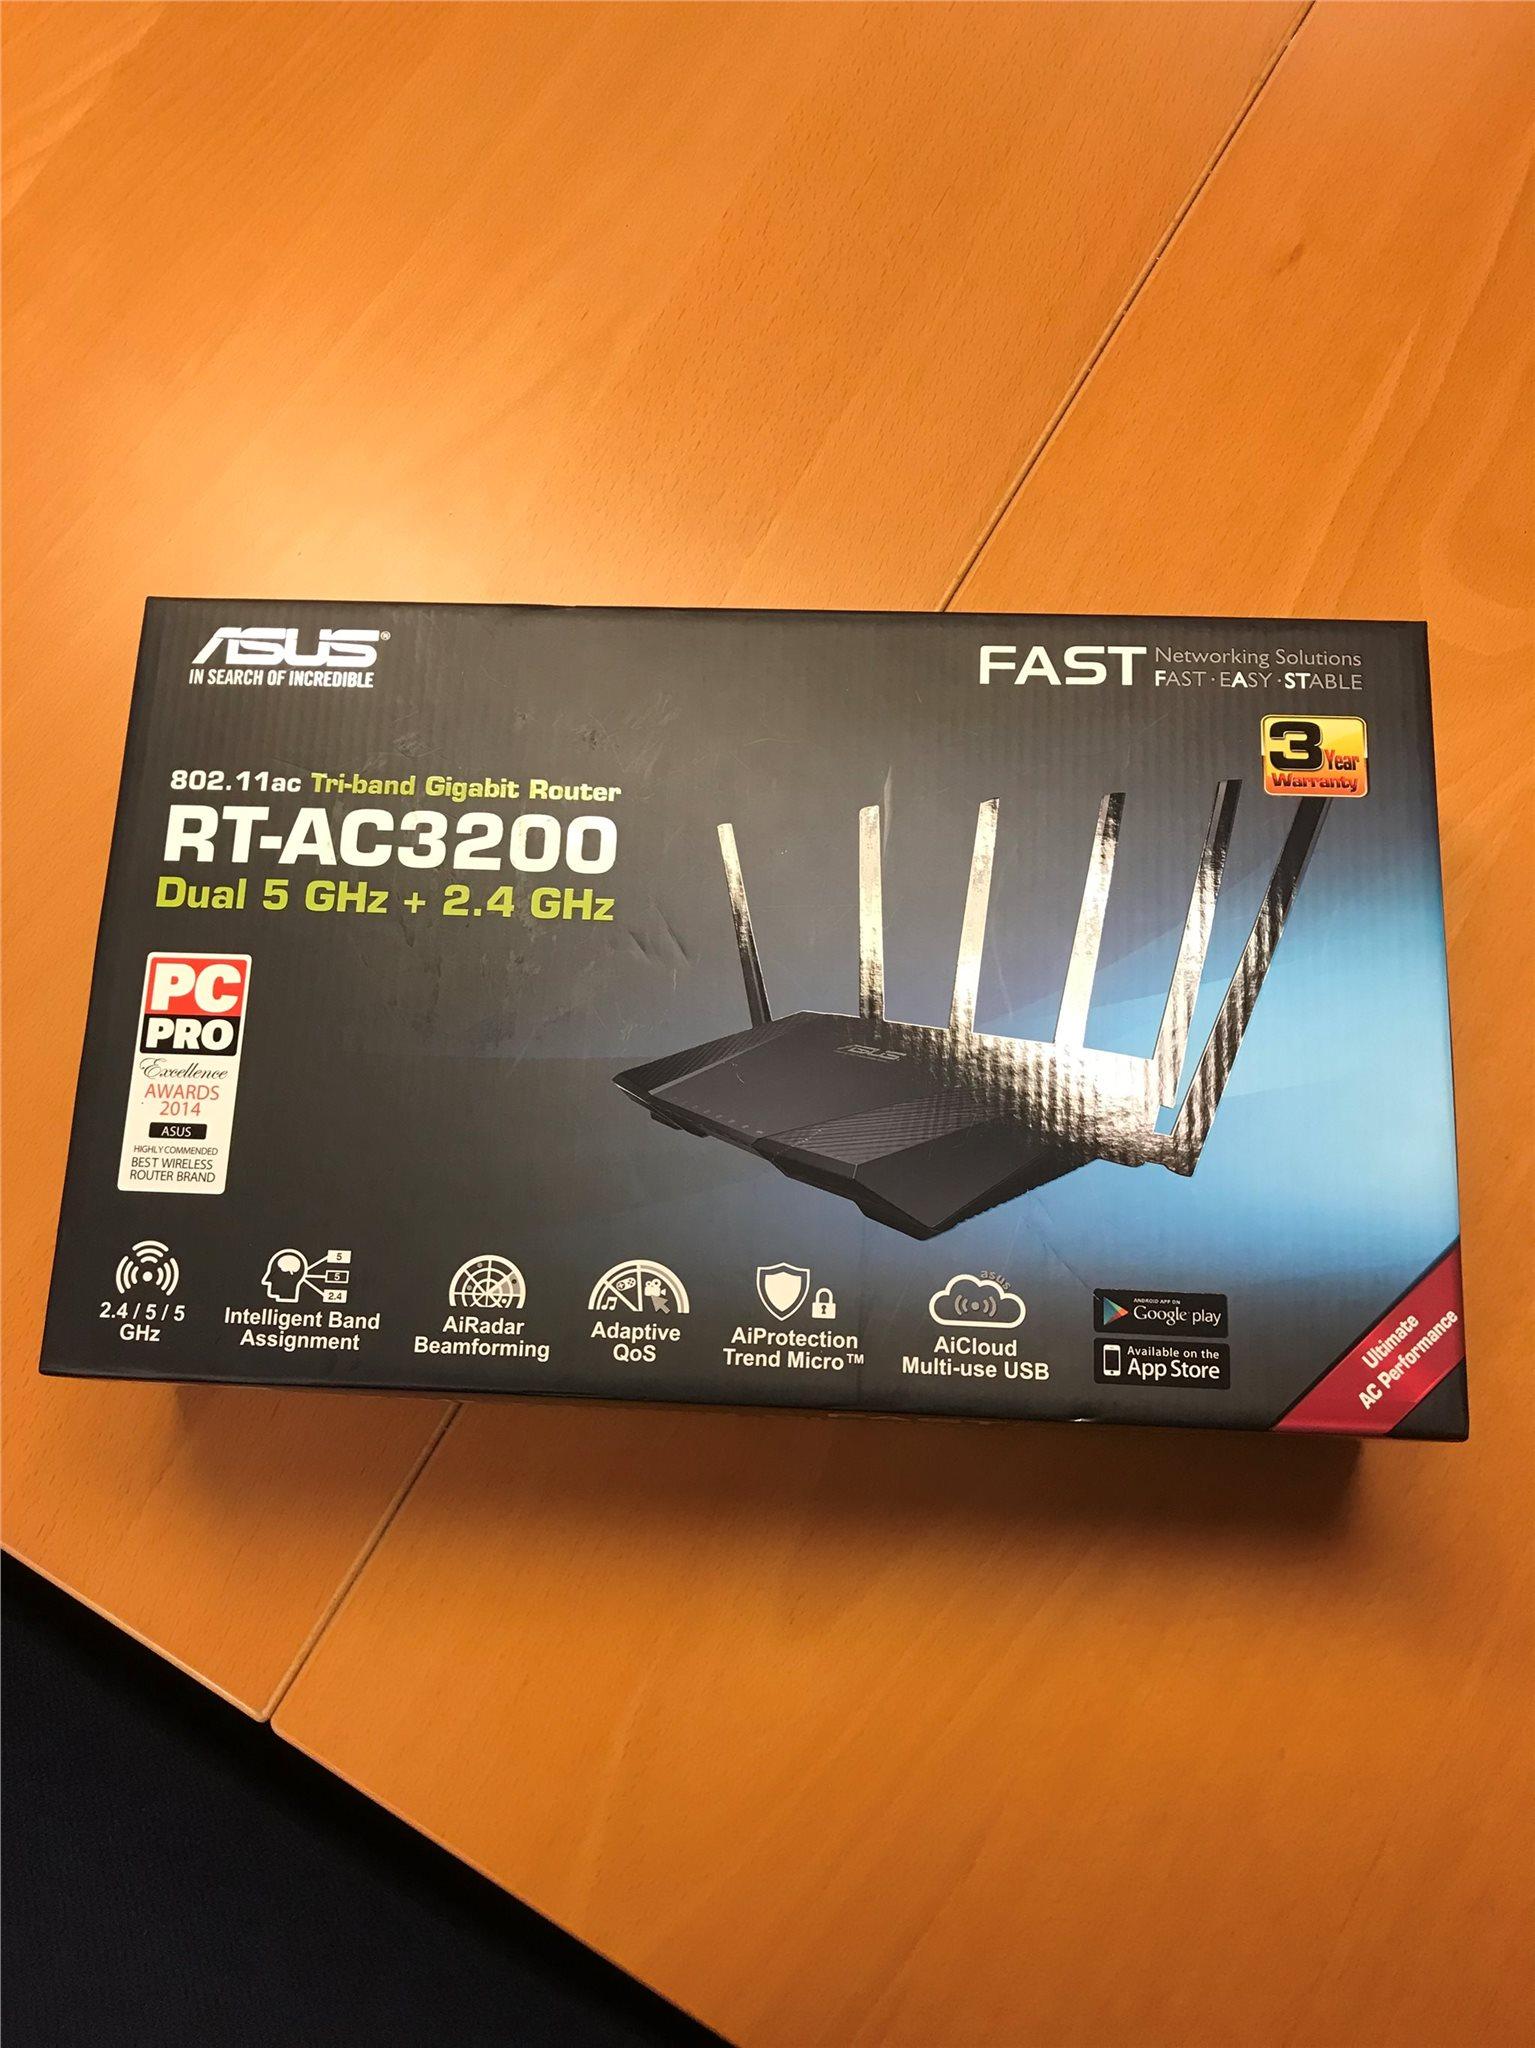 Asus Rt Ac3200 Router 322416614 Kp P Tradera Tri Band Gigabit Wireless Ac 3200 Mbps